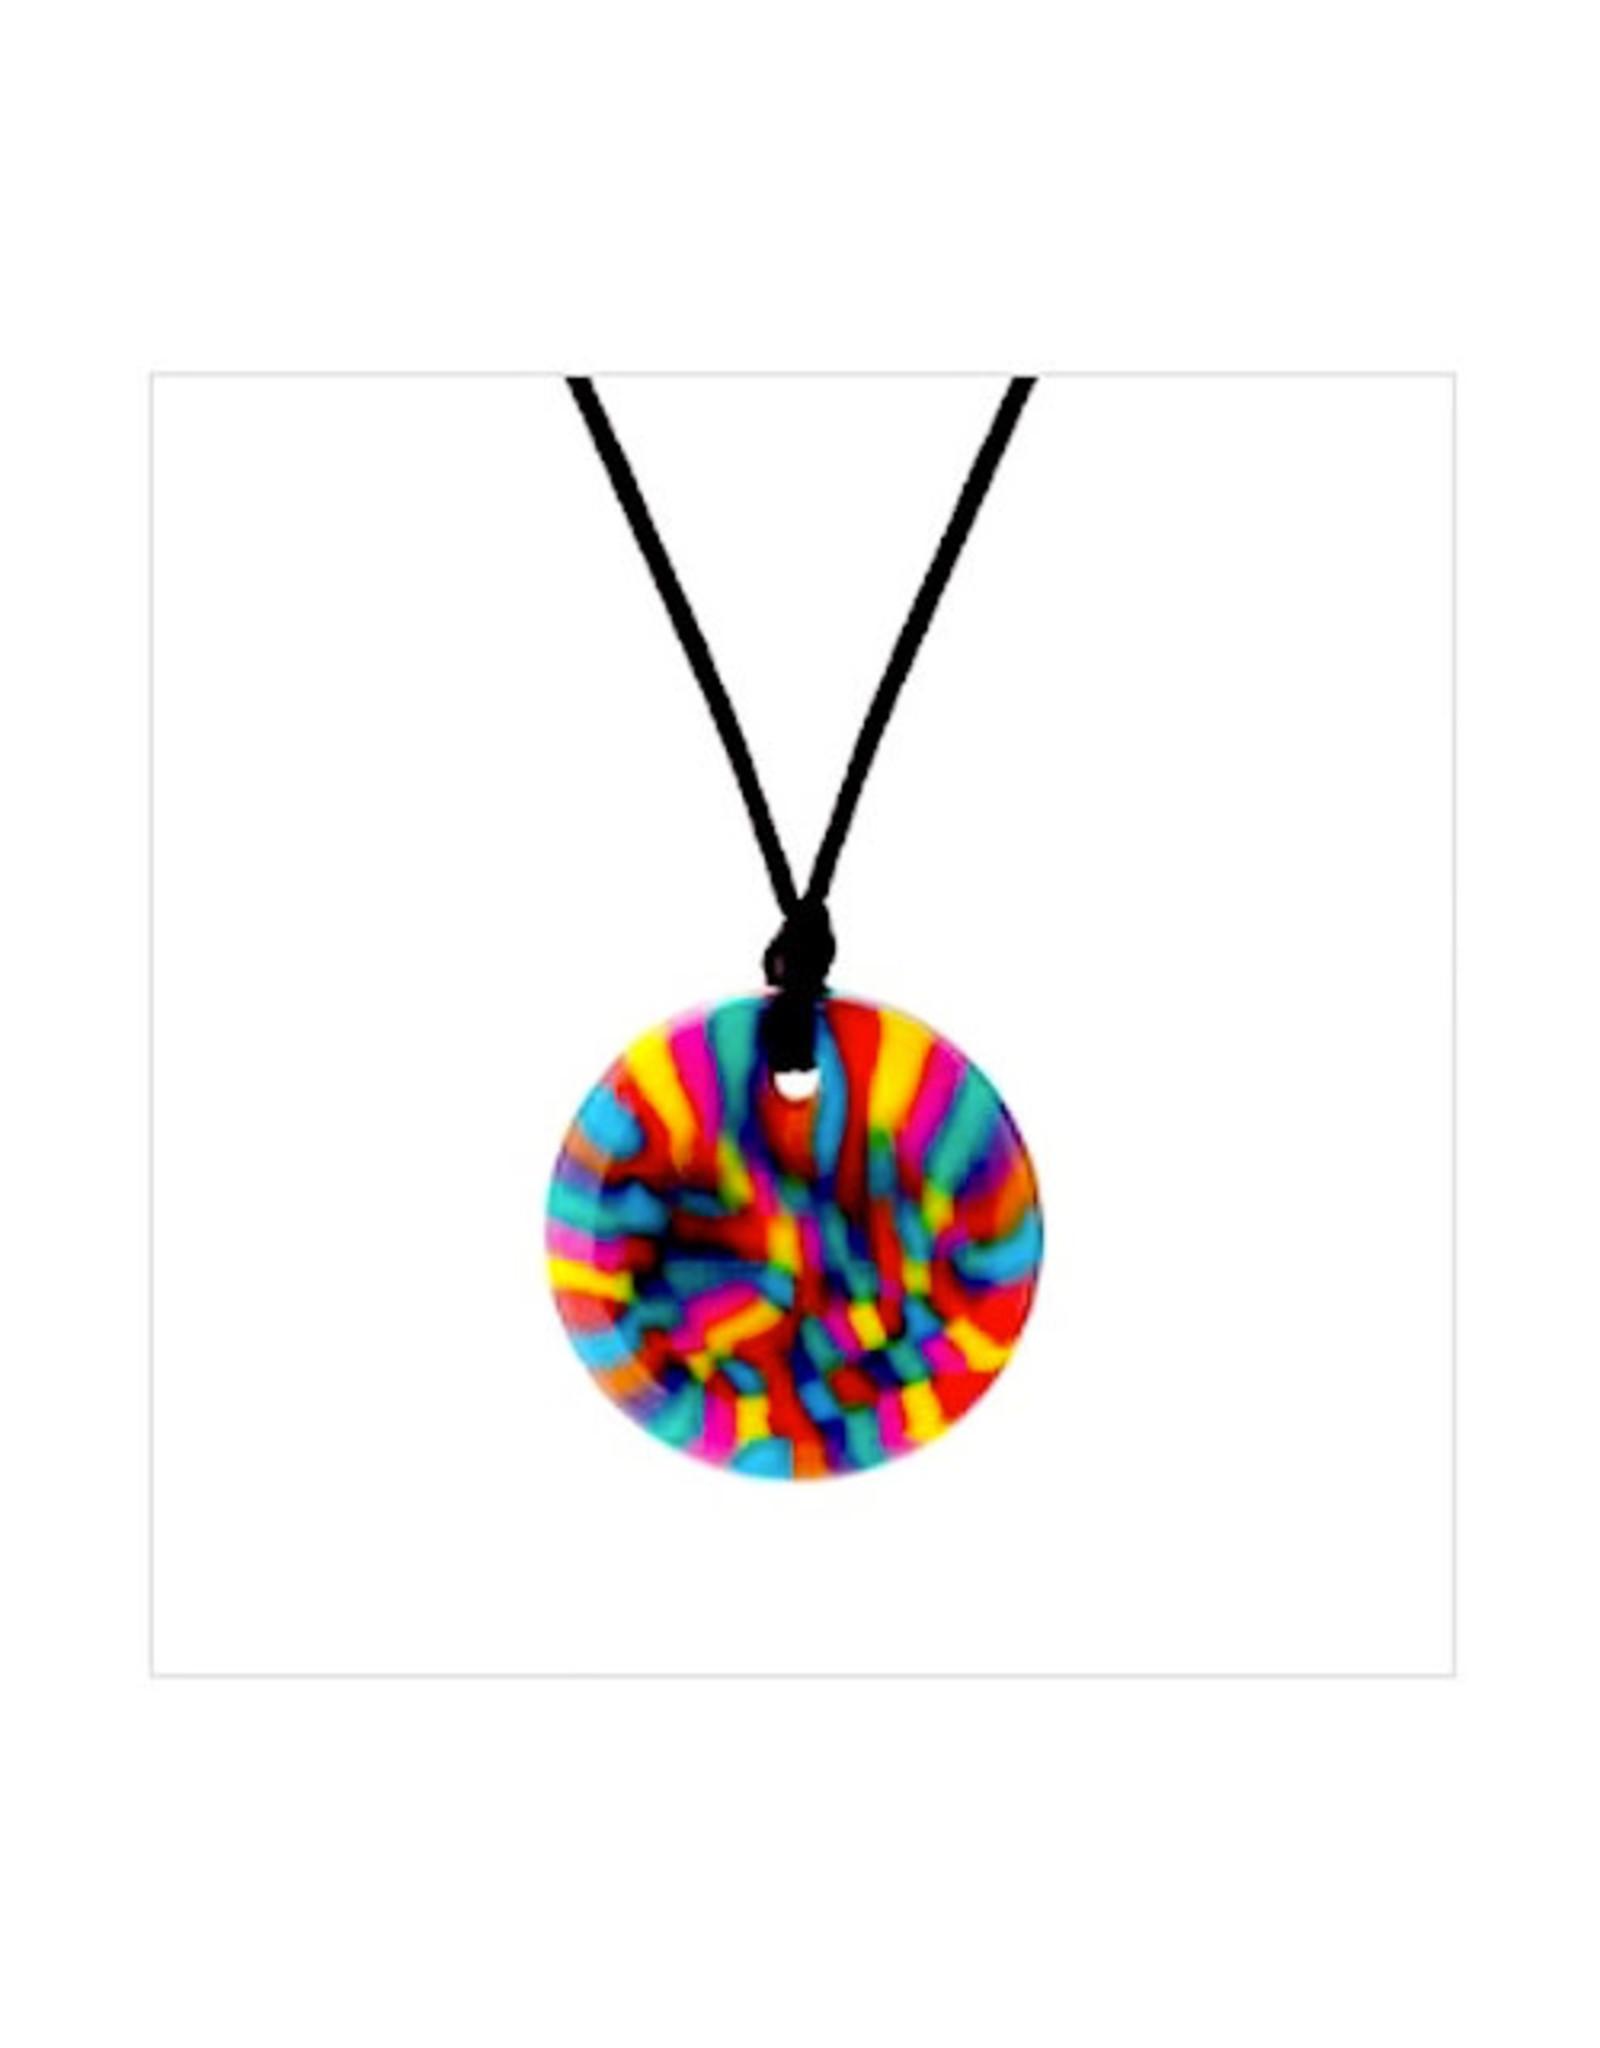 Chewigem Chewlery Disc  Necklace